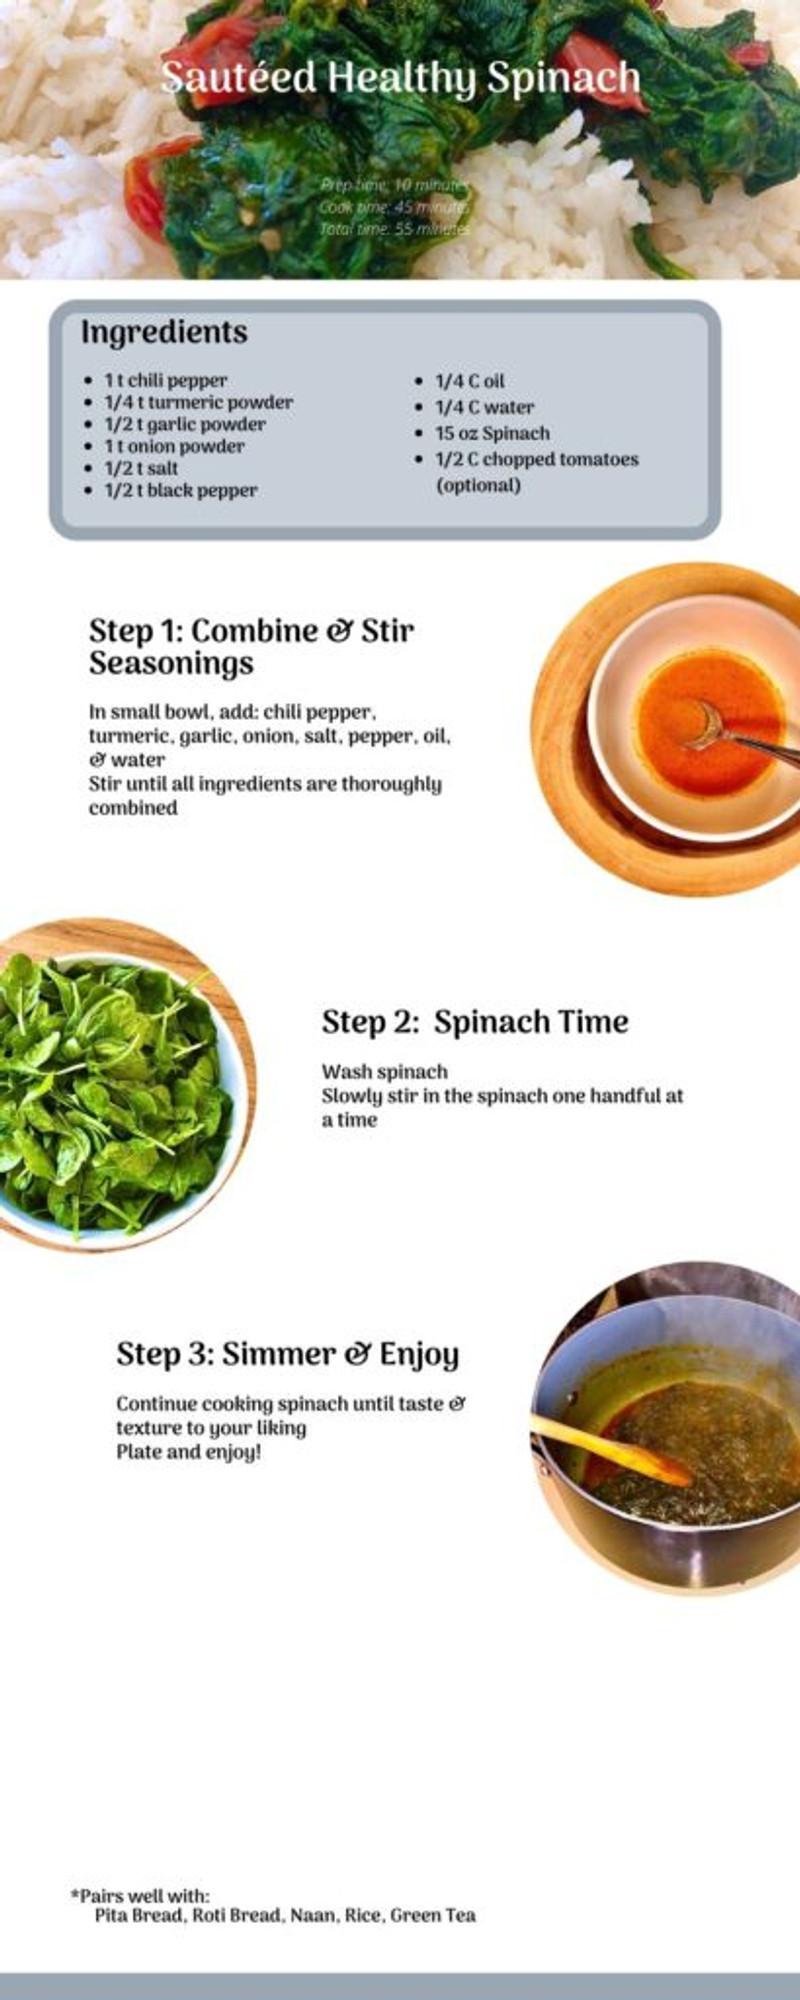 sauteed healthy spinach recipe